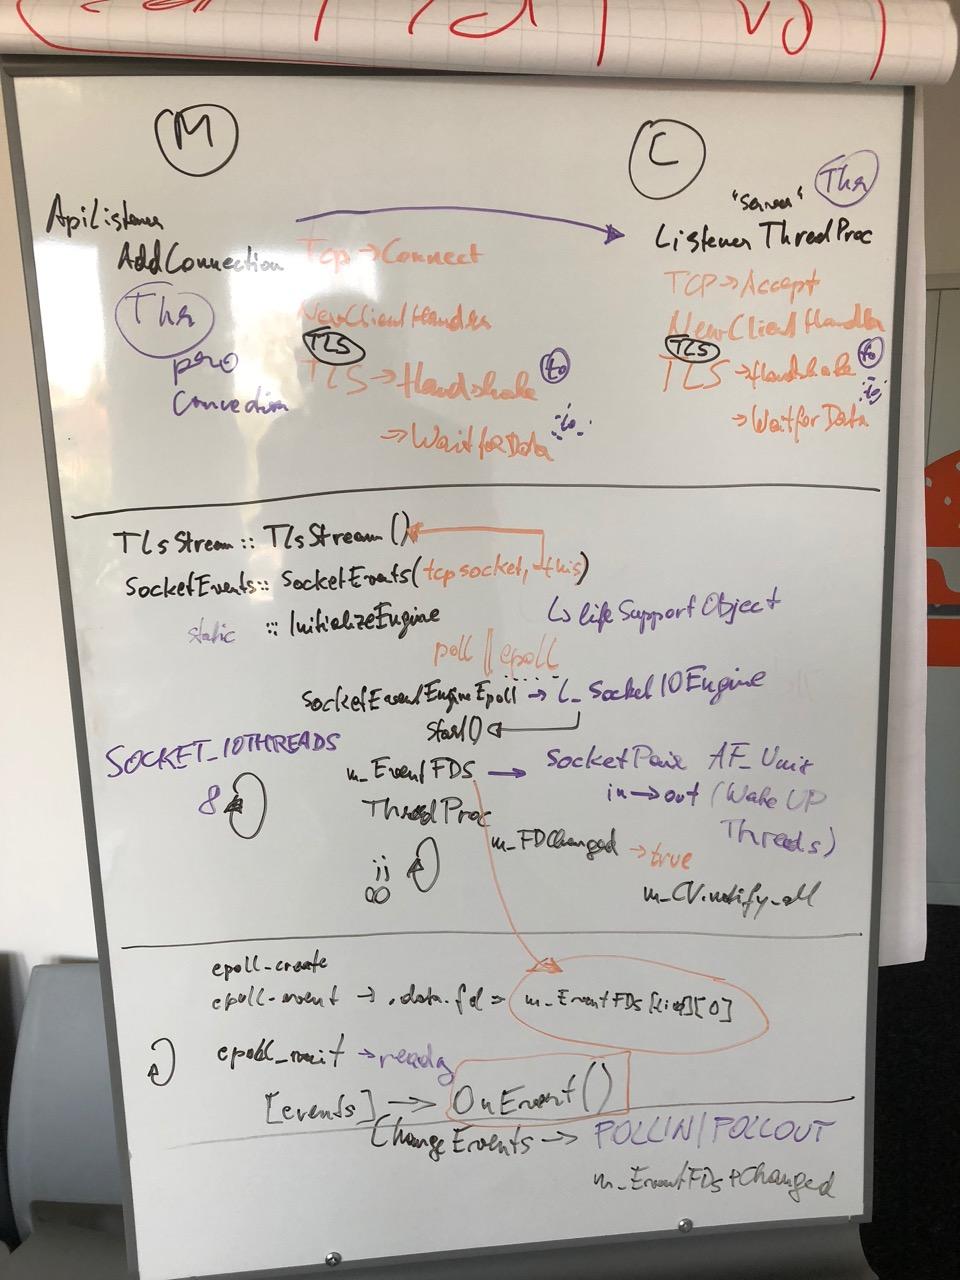 icinga2_socket_tls_timeouts_code_analysis_01